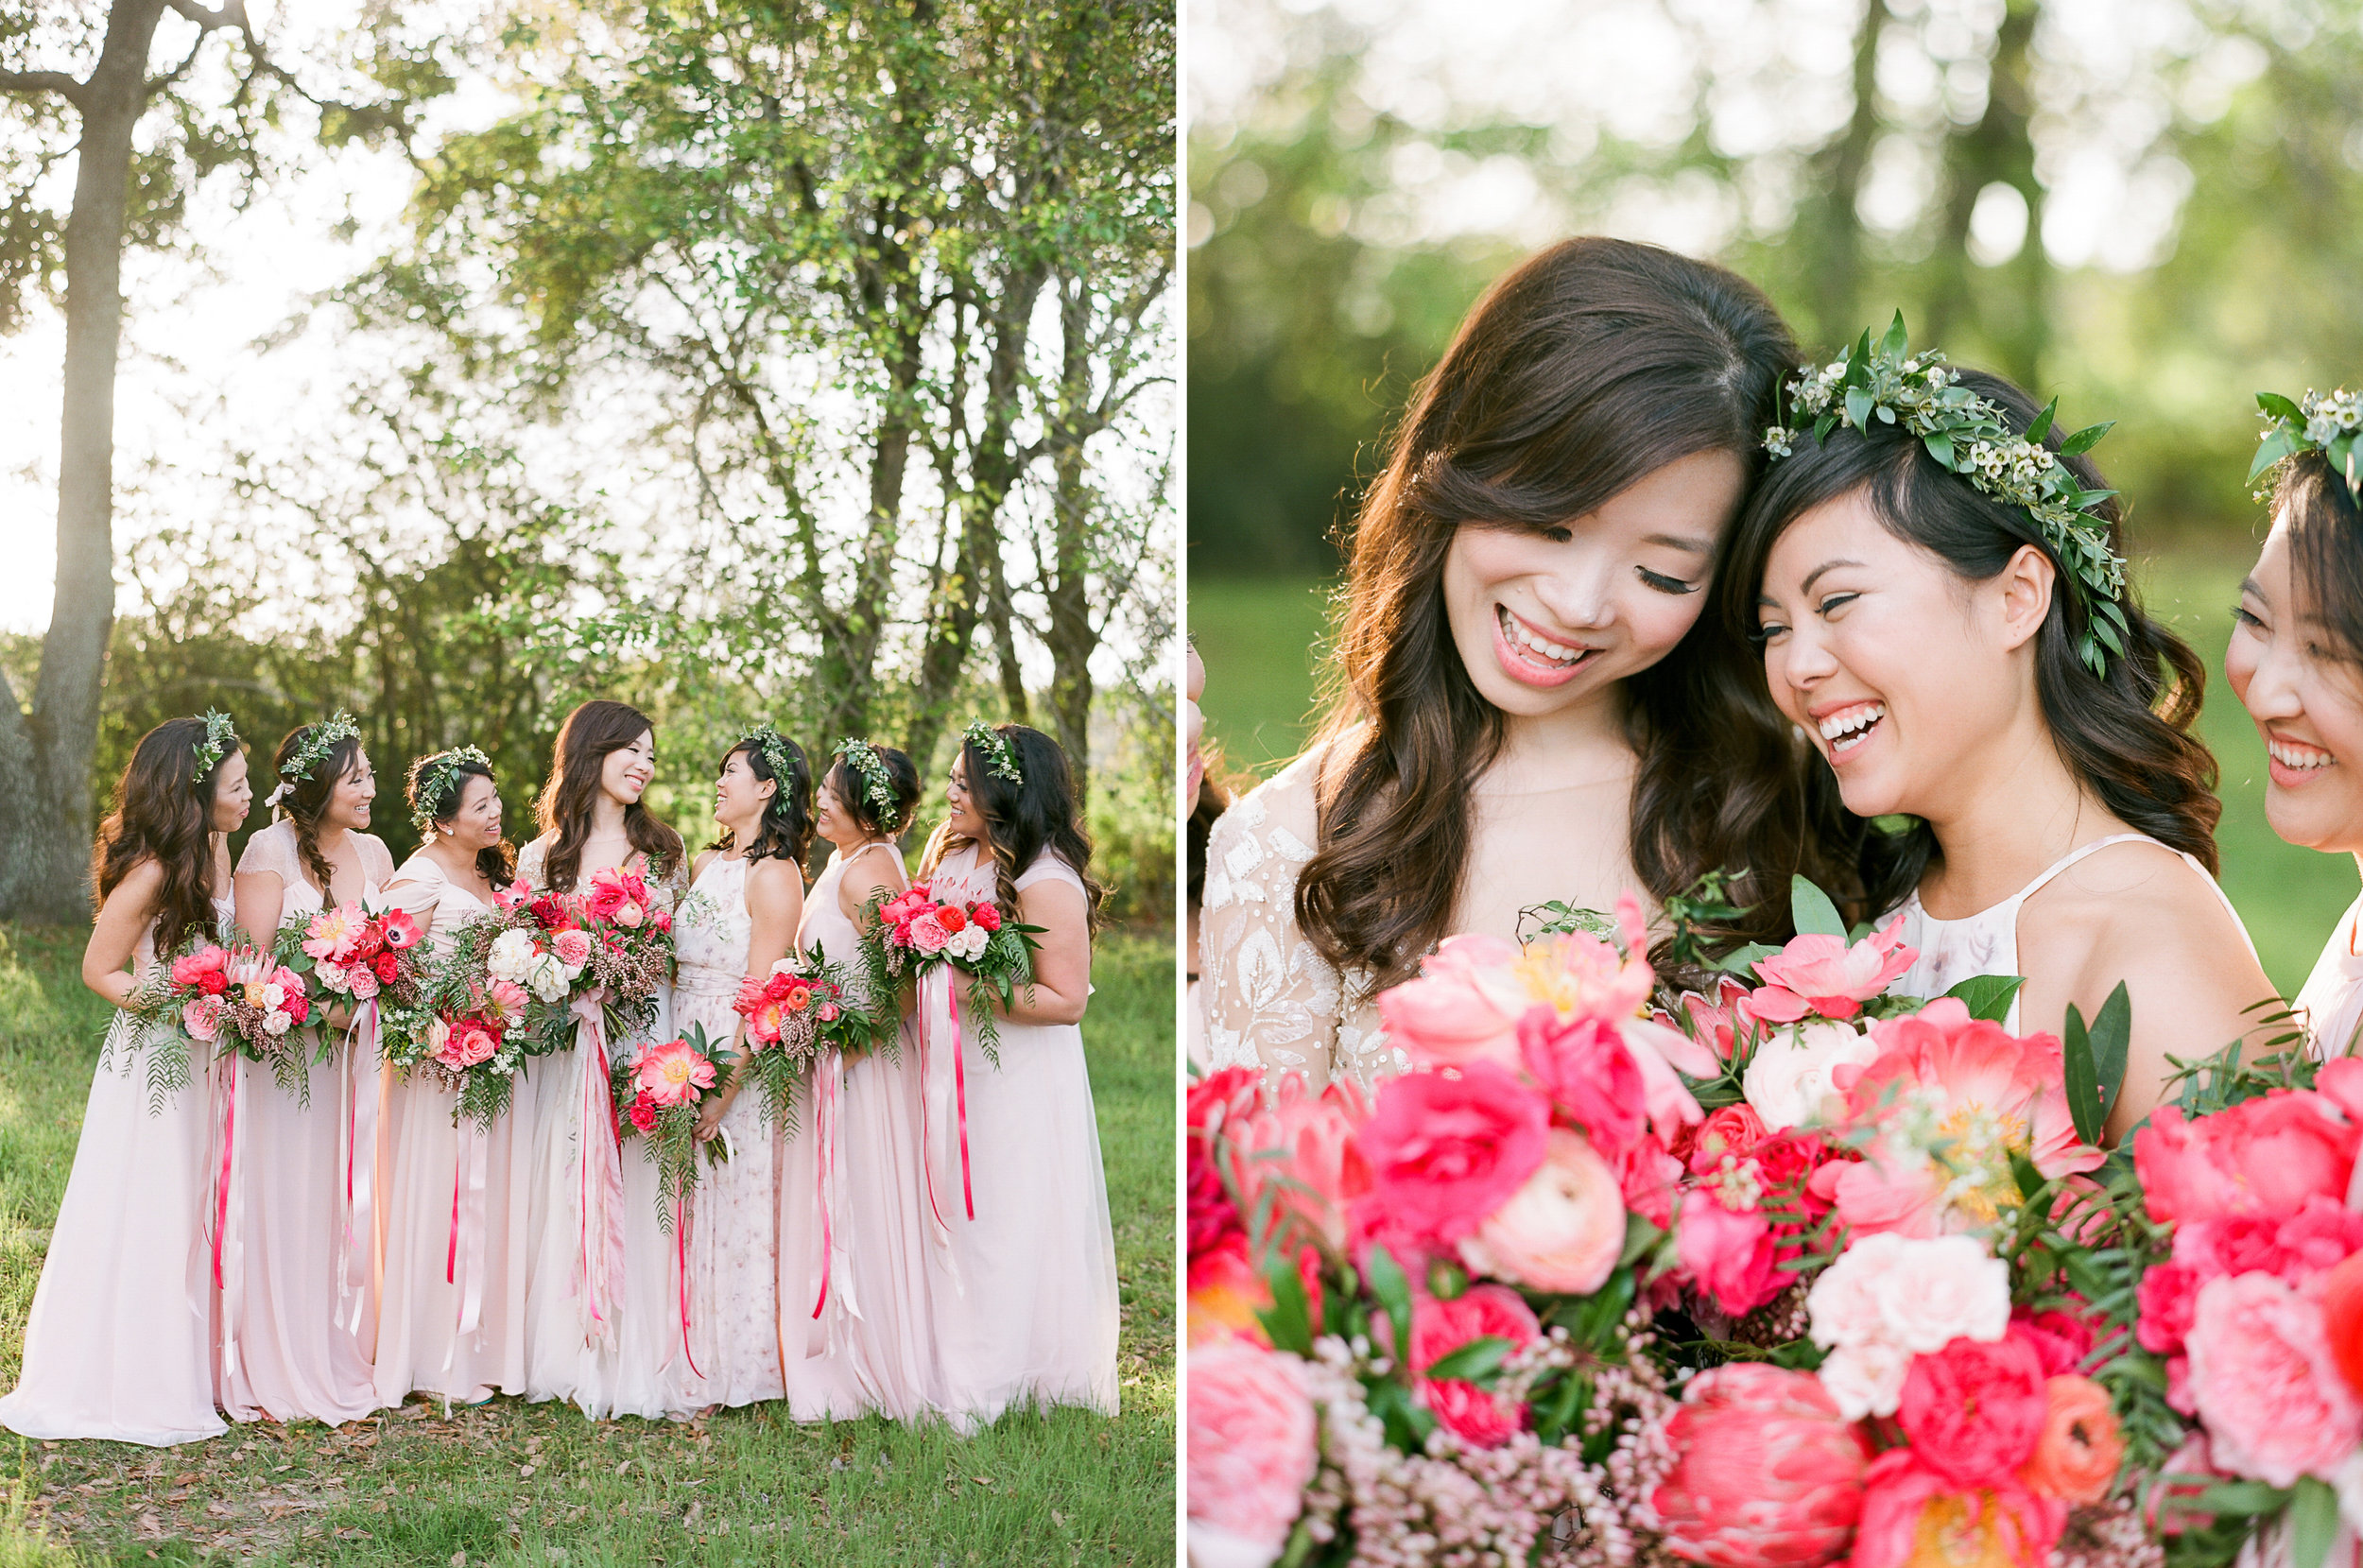 The-Knot-50-Weddings-50-States-Texas-Winner-Dana-Fernandez-photography-houston-wedding-photographer-film-fine-art-destination-110.jpg